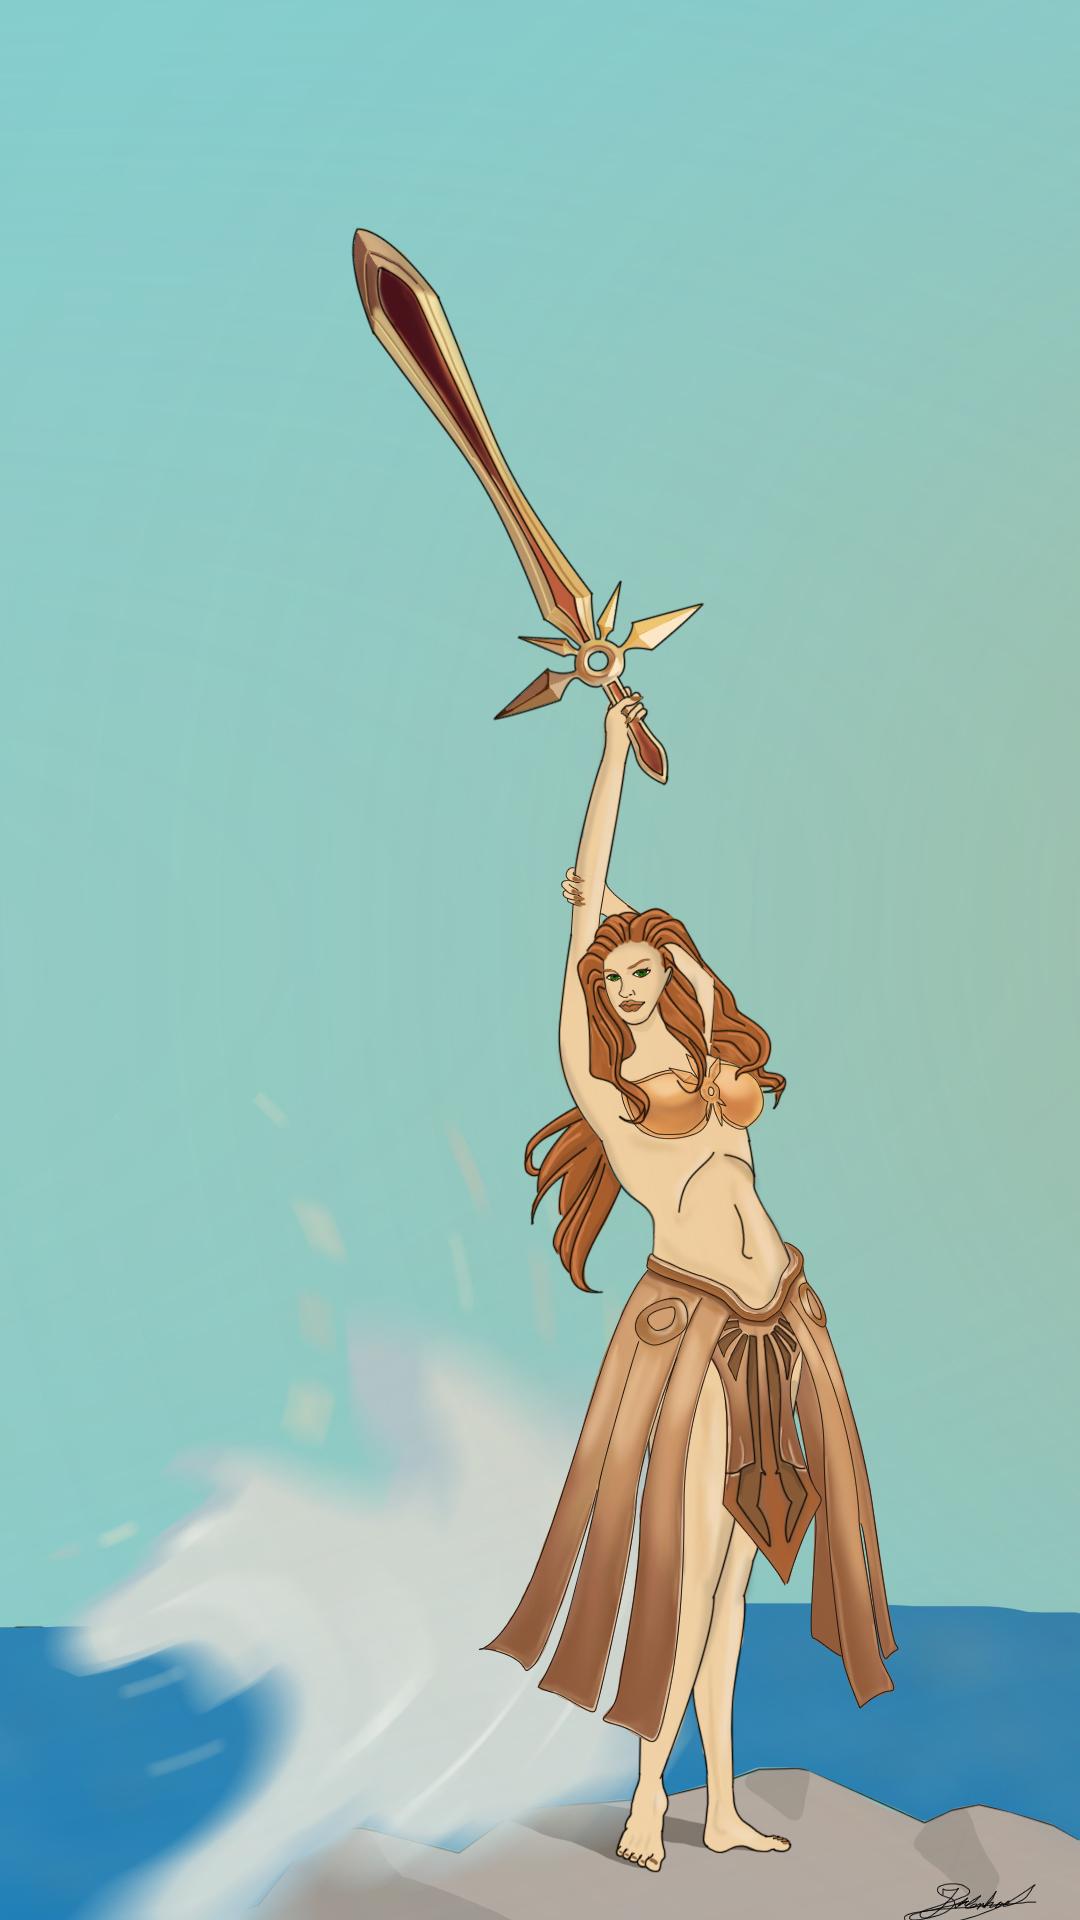 leona the radiant dawn skins - photo #12